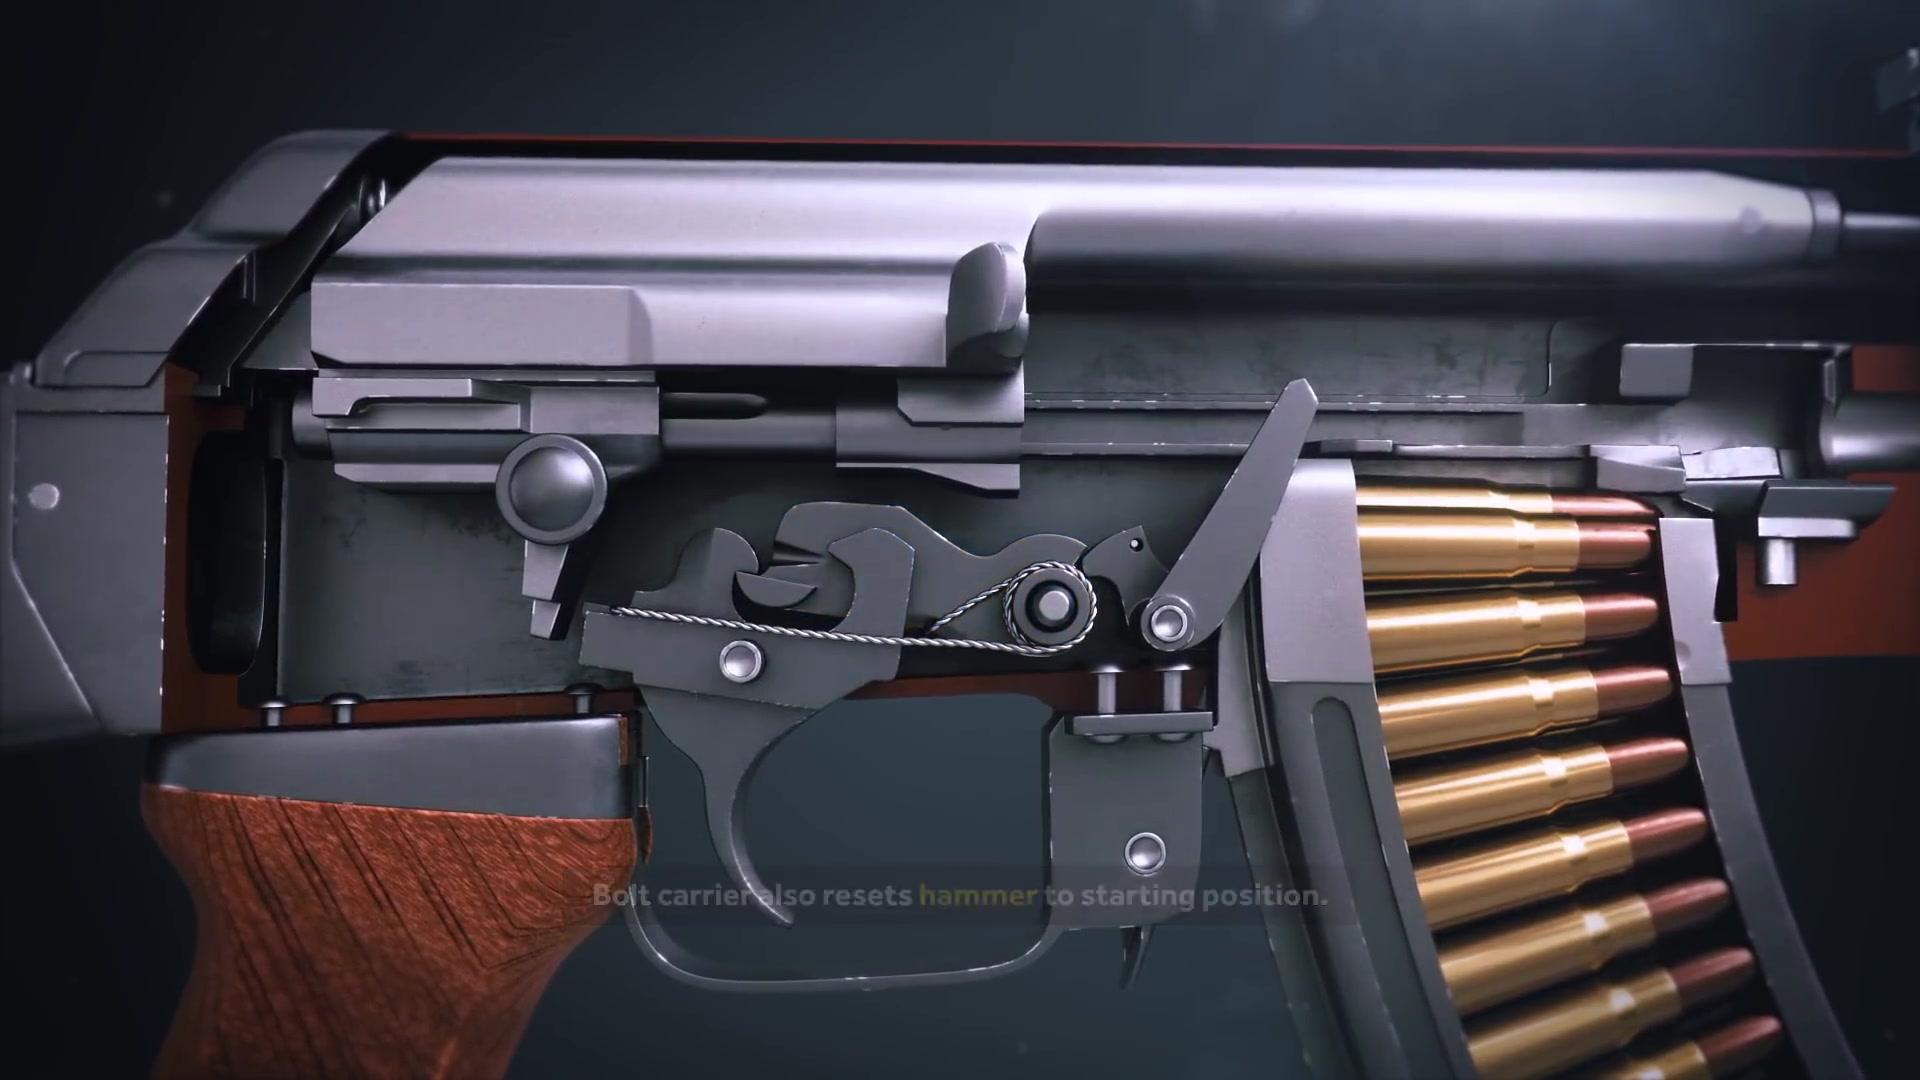 ak47原理图动画_AK-47是如何工作的!_哔哩哔哩 (゜-゜)つロ 干杯~-bilibili